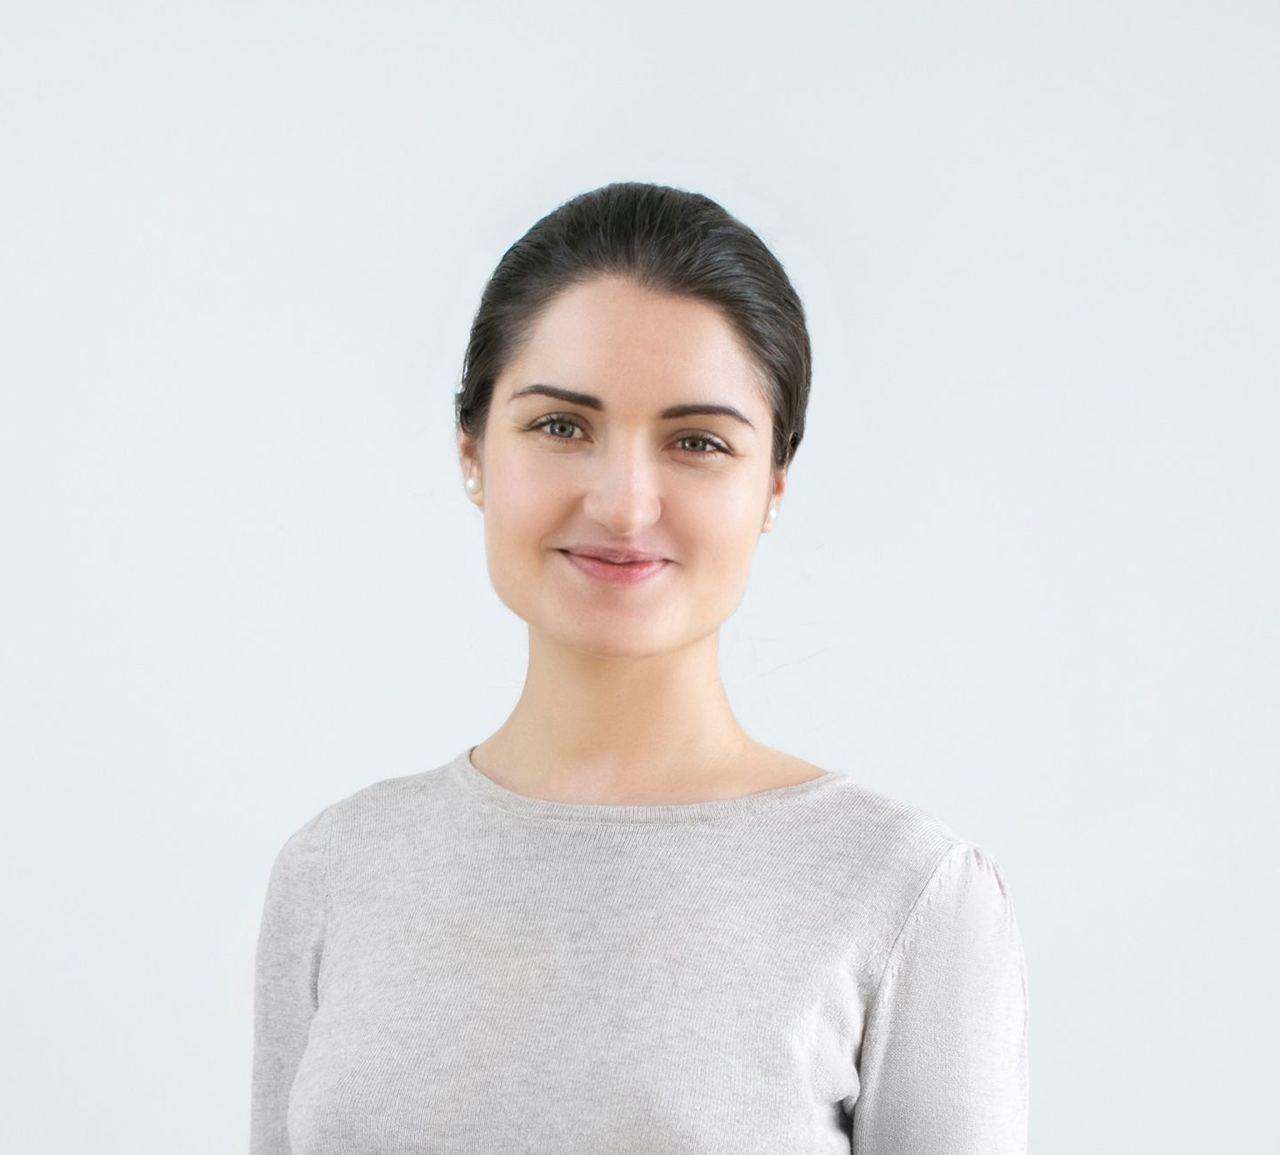 Рзаєва Роксана - фото № 1